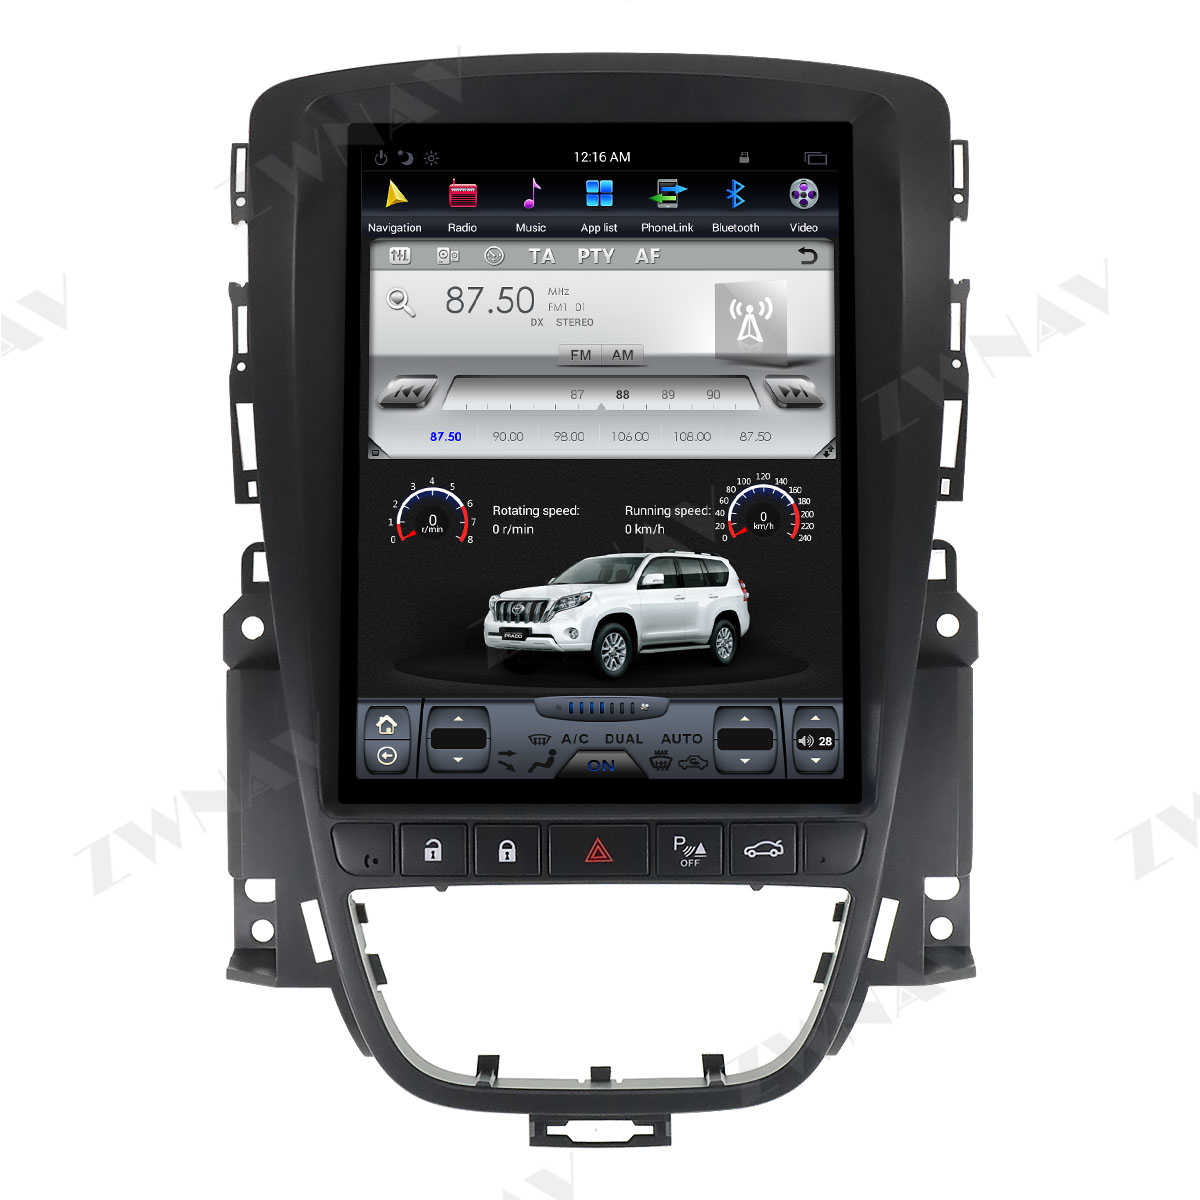 Verticl Tesla Gaya Android 9.0 Car Multimedia Player untuk Opel Vauxhall Holden Astra J 2010-2013 GPS Navi Radio stereo Kepala Unit